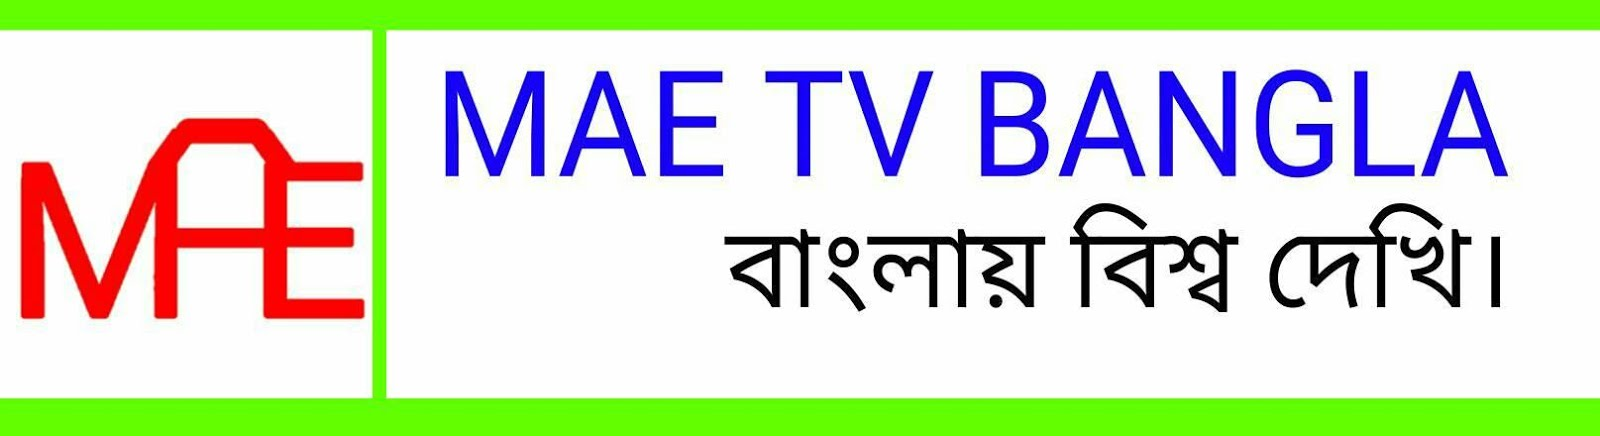 MAE TV BANGLA